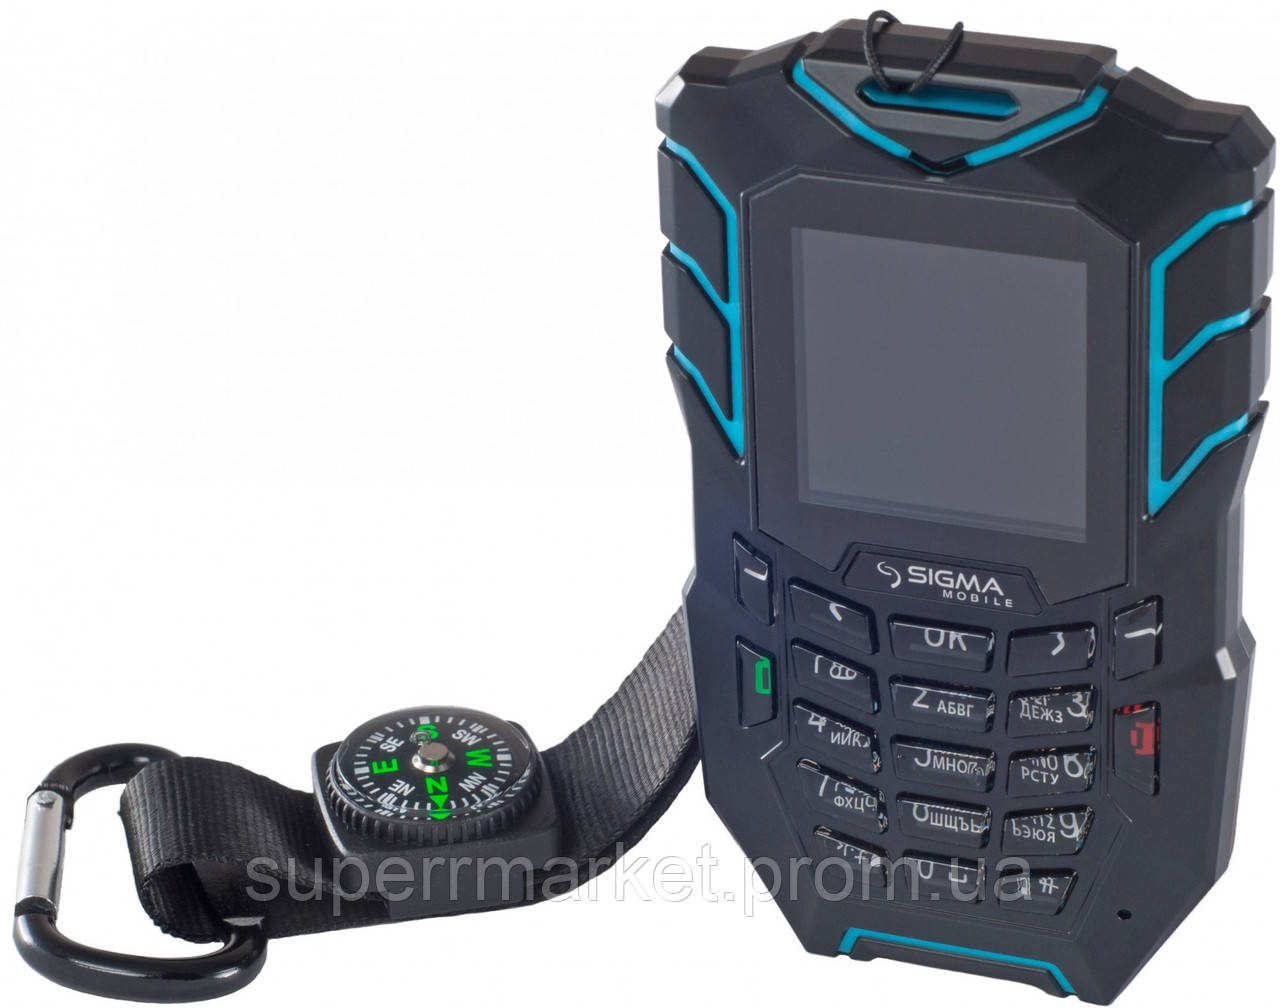 Телефон Sigma Х-treme AT67 Black-blue